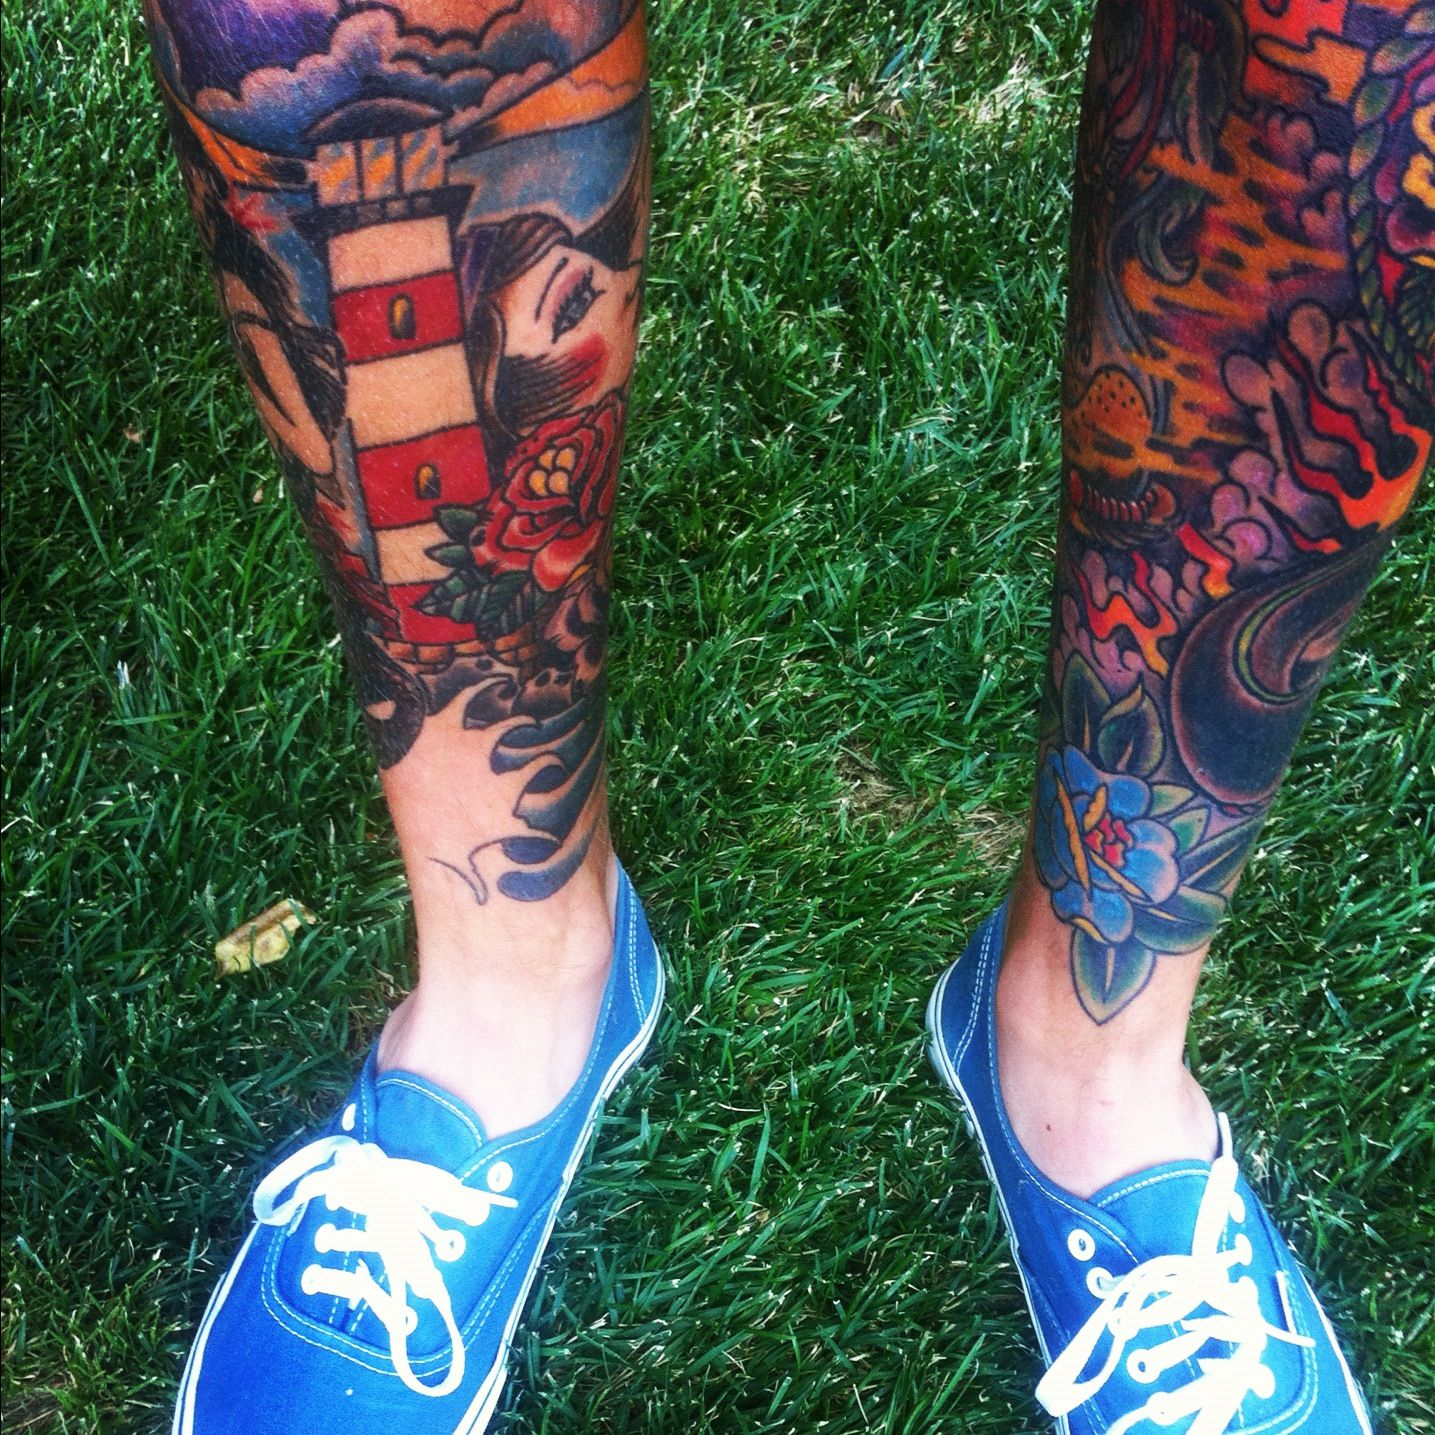 Lower leg guys traditional sleeve tattoos - Traditional Tattoos Leg Tattoos Leg Sleeve